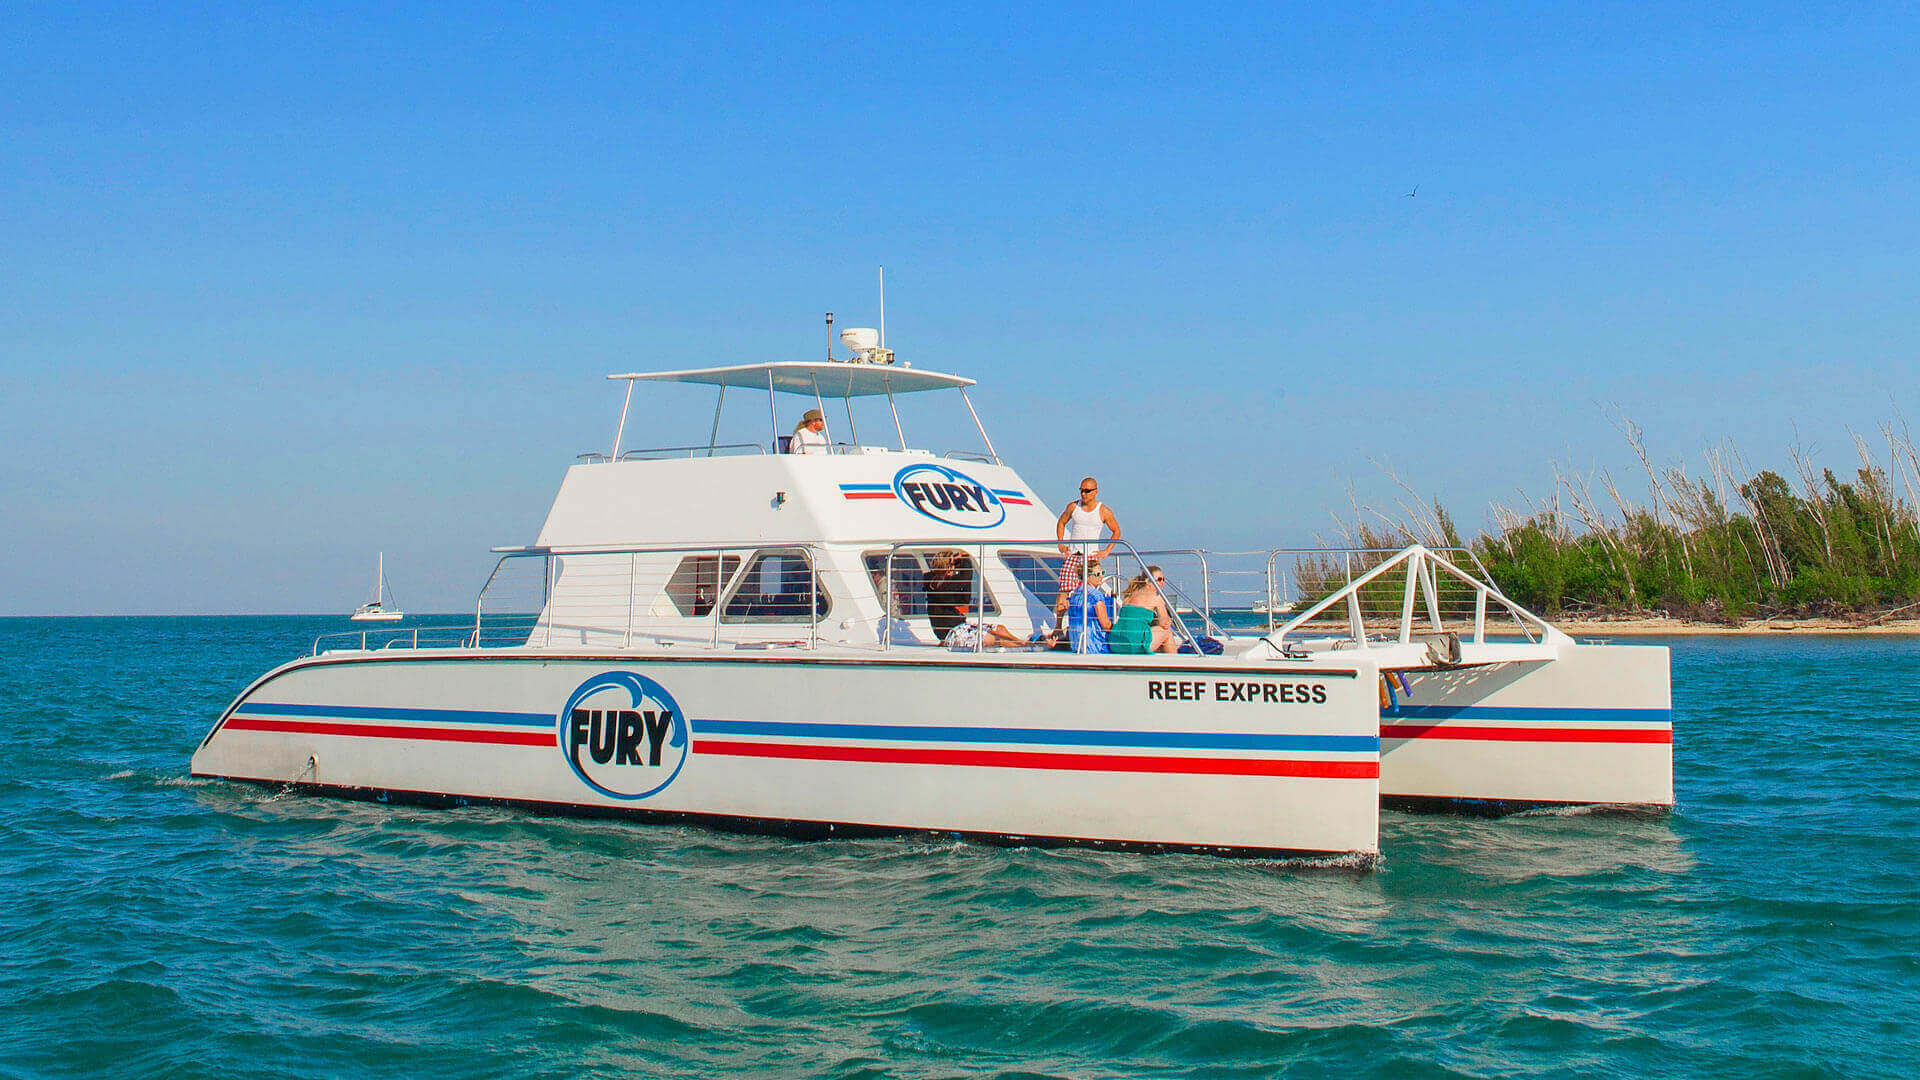 Fury's 57' Power Catamaran